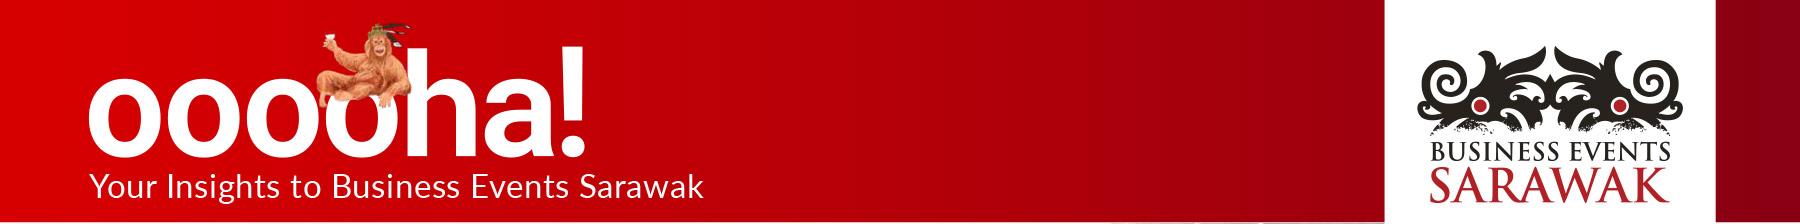 BESarawak Industry Related News – July 2021